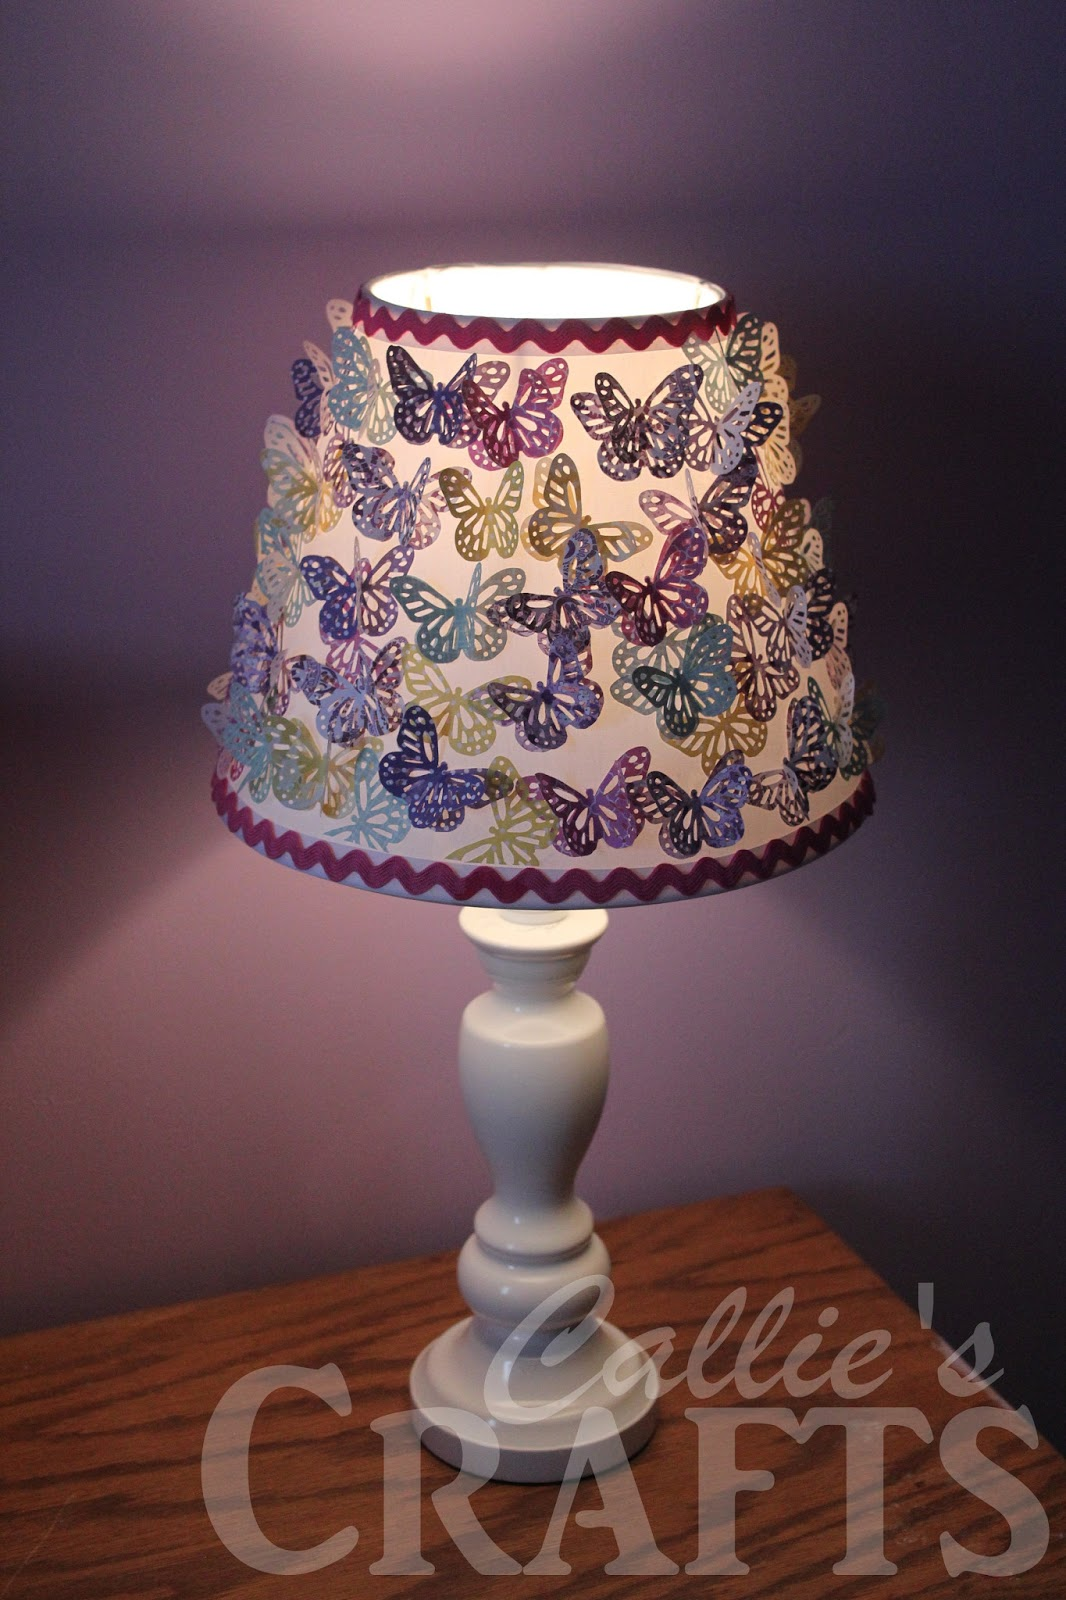 Callie S Crafts Mod Podge Amp Paper Butterflies Lamp Shade